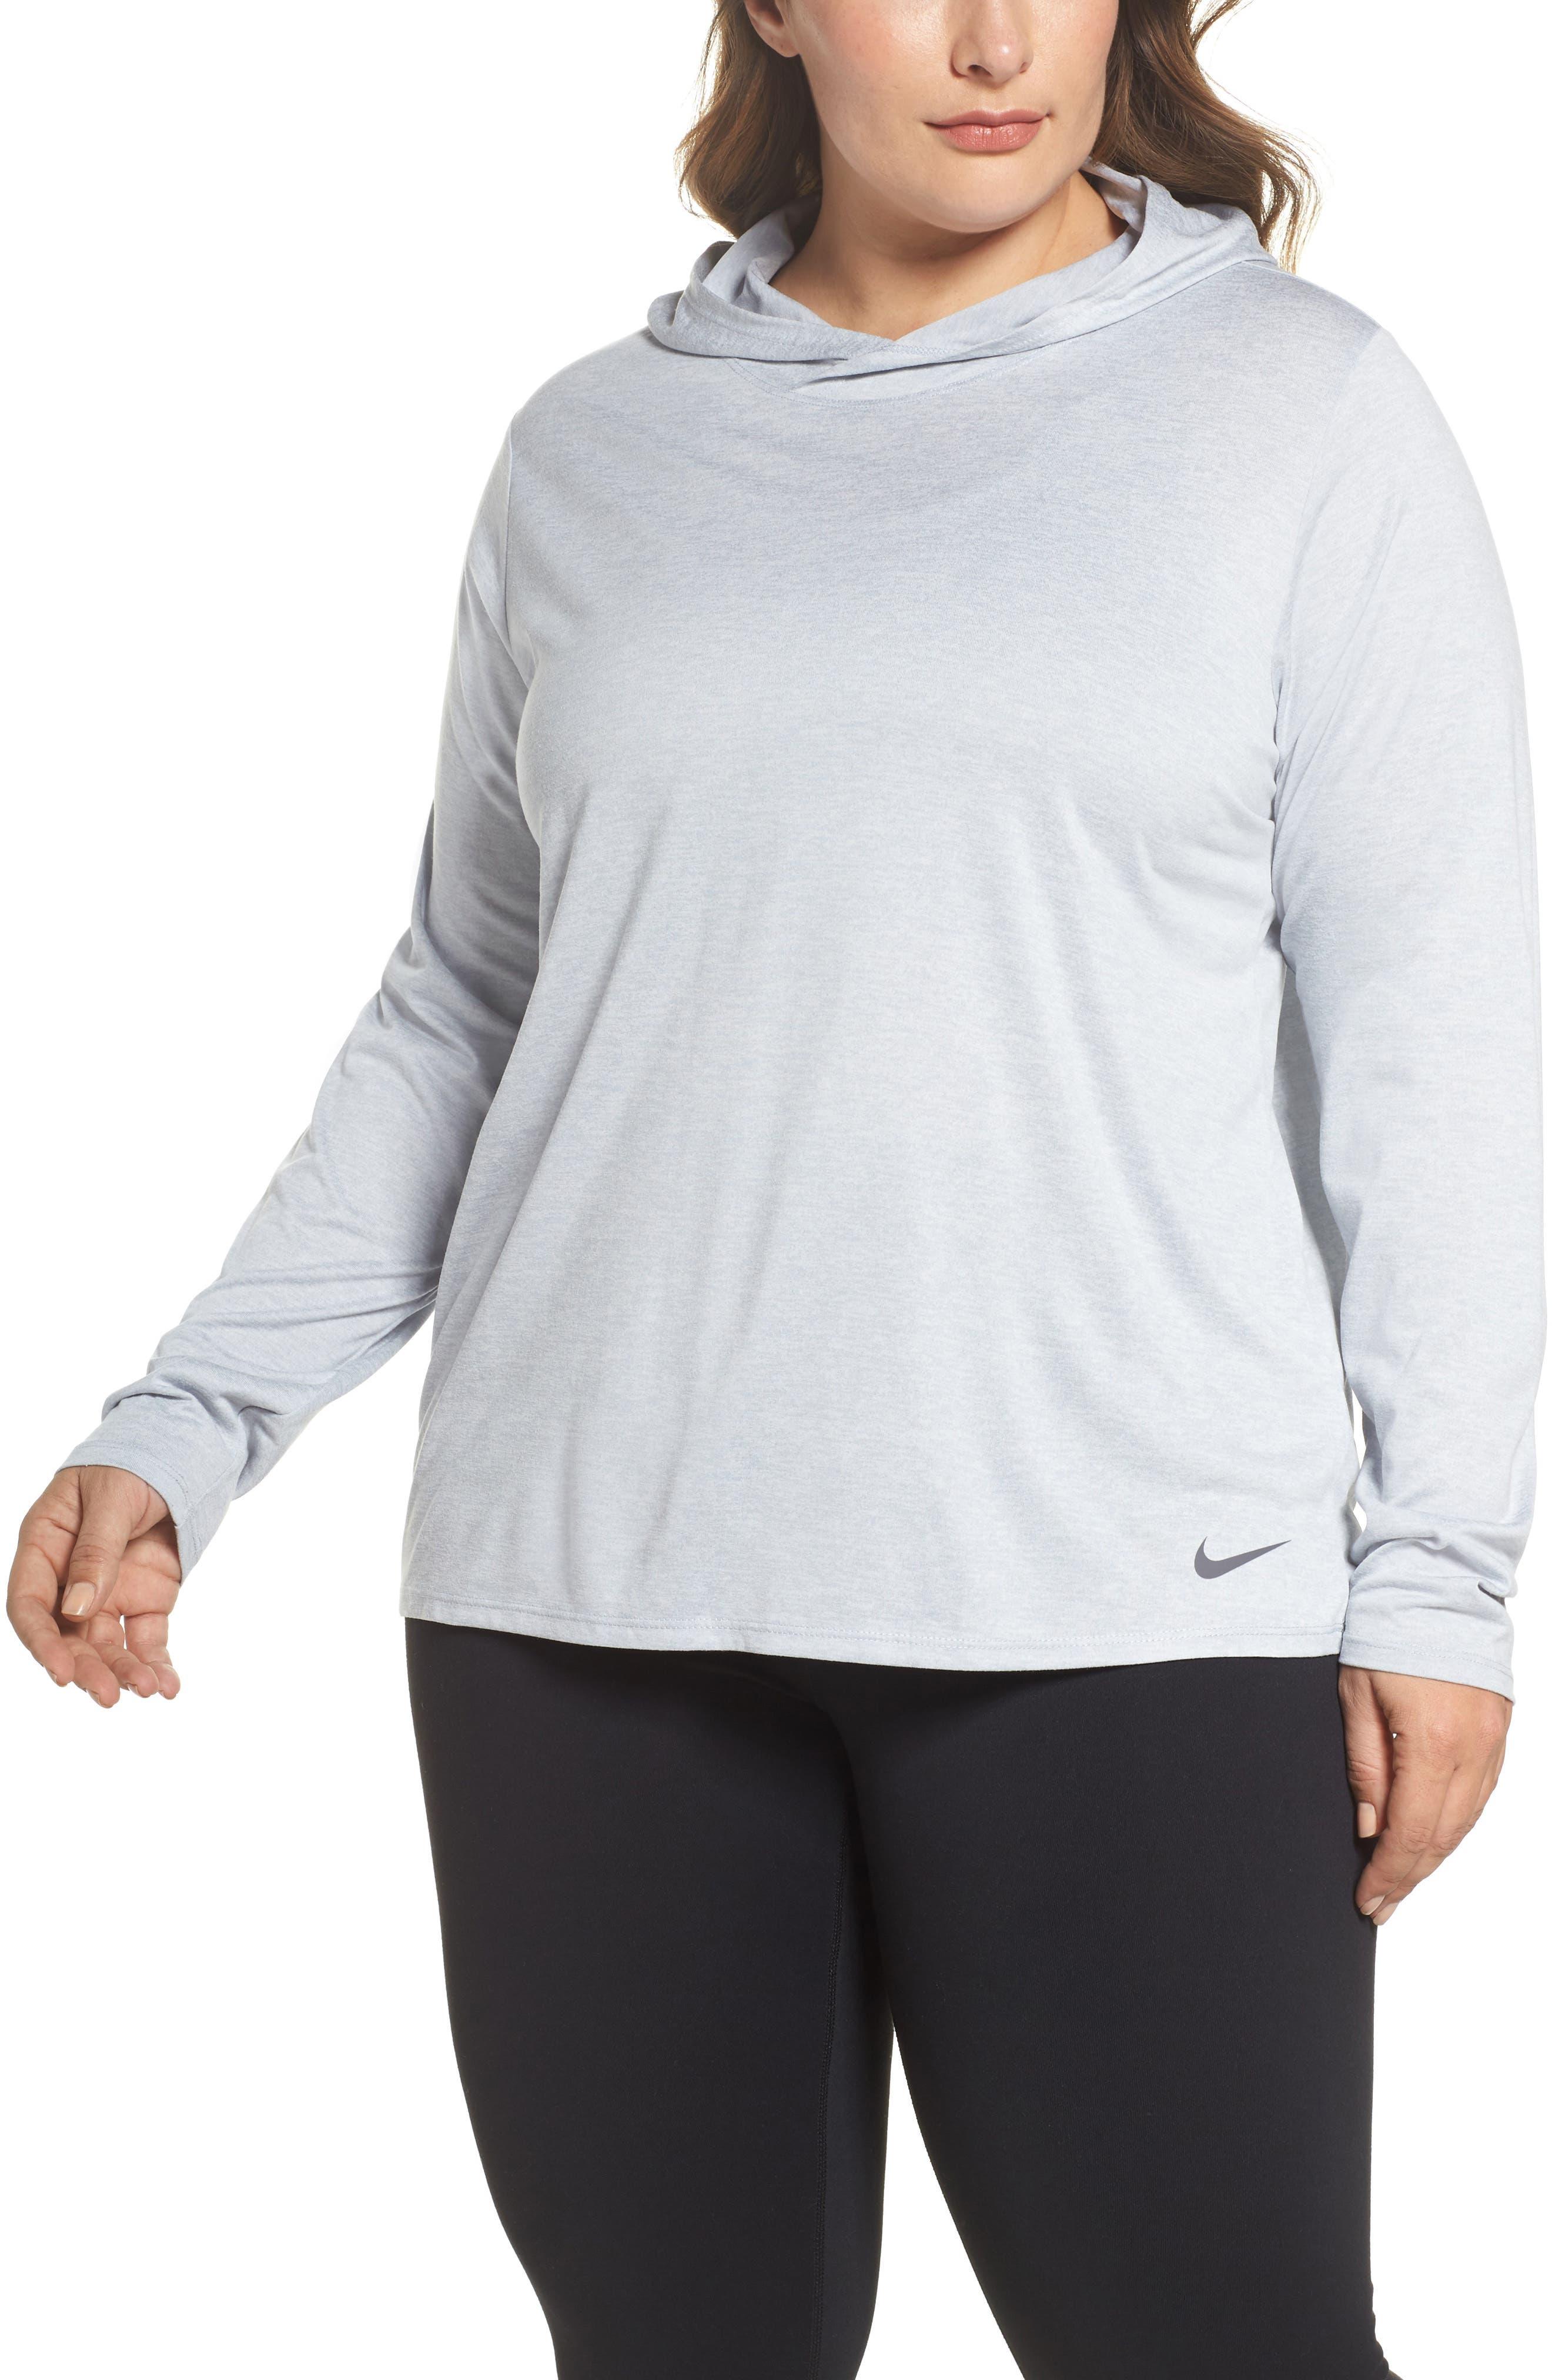 Nike Dry Training Hoodie (Plus Size)